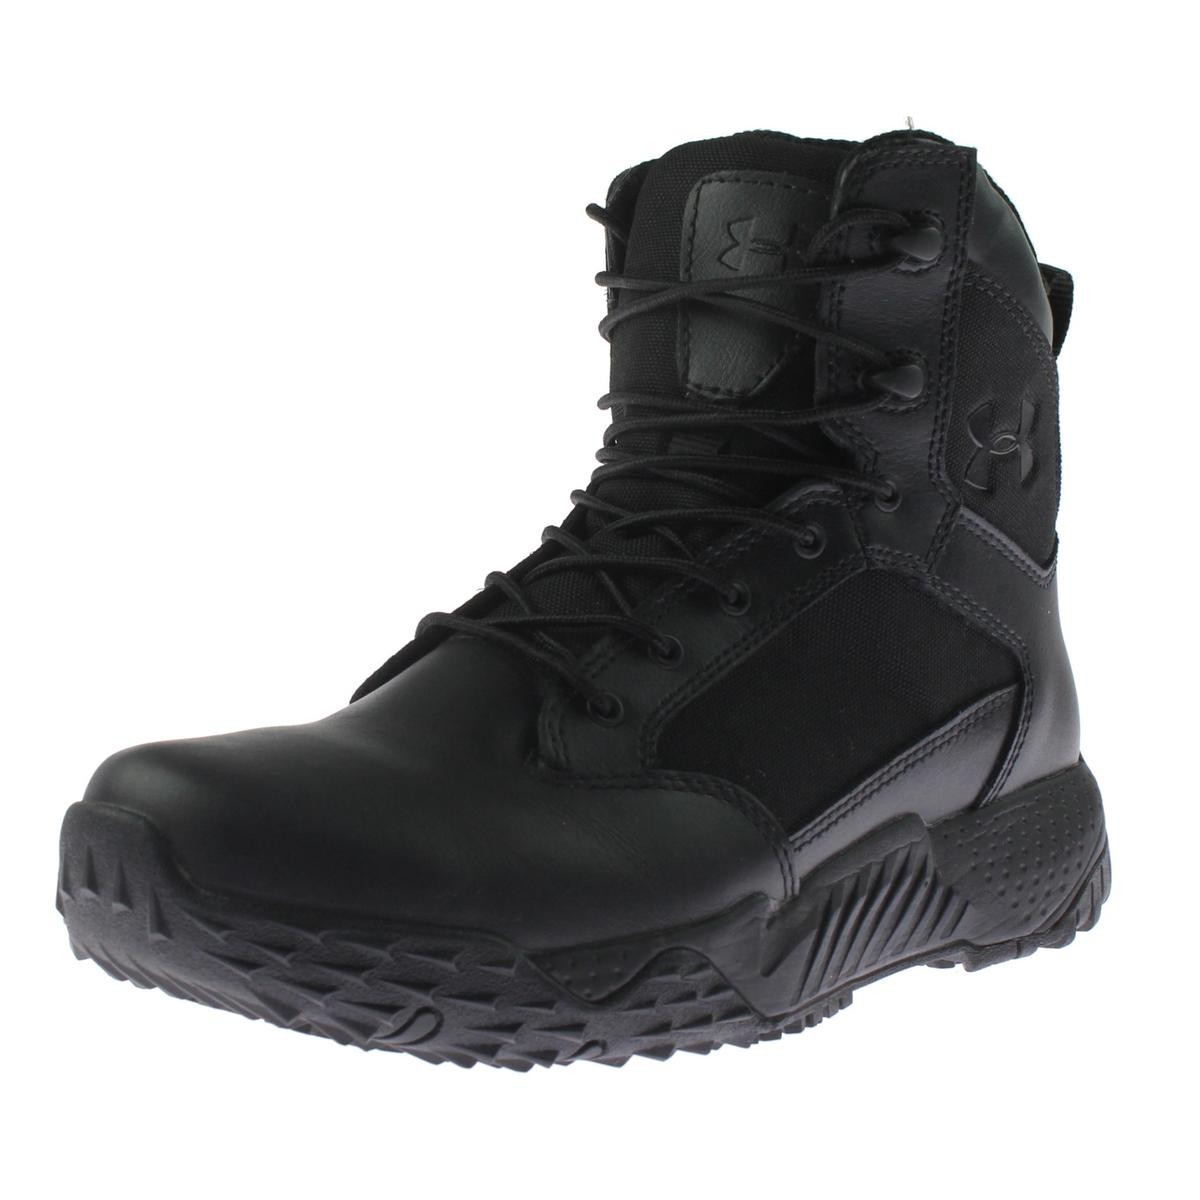 nacido Descripción Óptima  Under Armour - Womens Stellar Leather Water Repellent Tactical Boots -  Walmart.com - Walmart.com